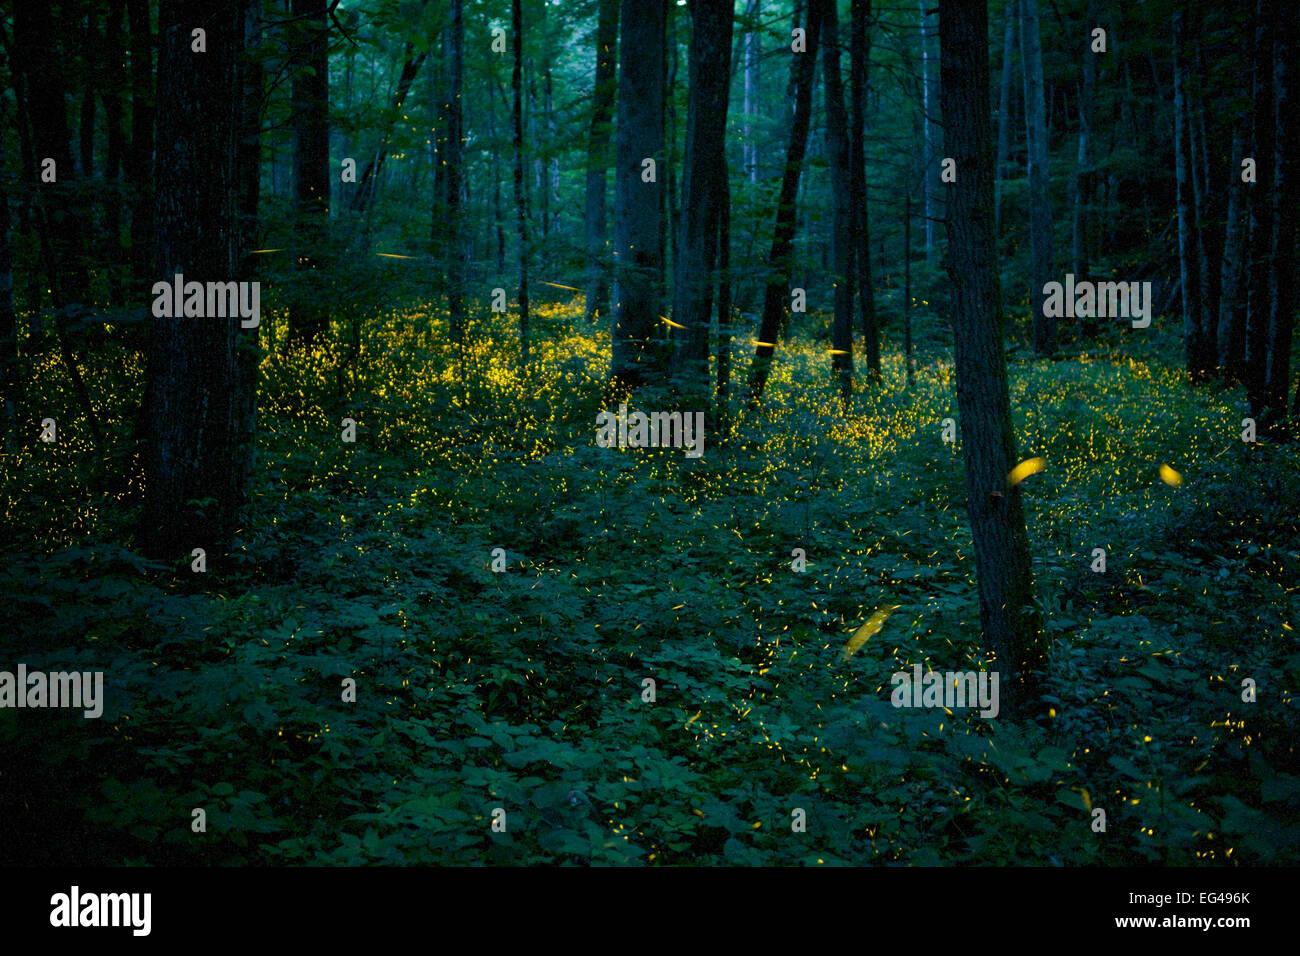 Syncronous Fireflies (Photinus carolinus) illuminate the lush forests Smoky Mountains National Park Tennesse USA Stock Photo